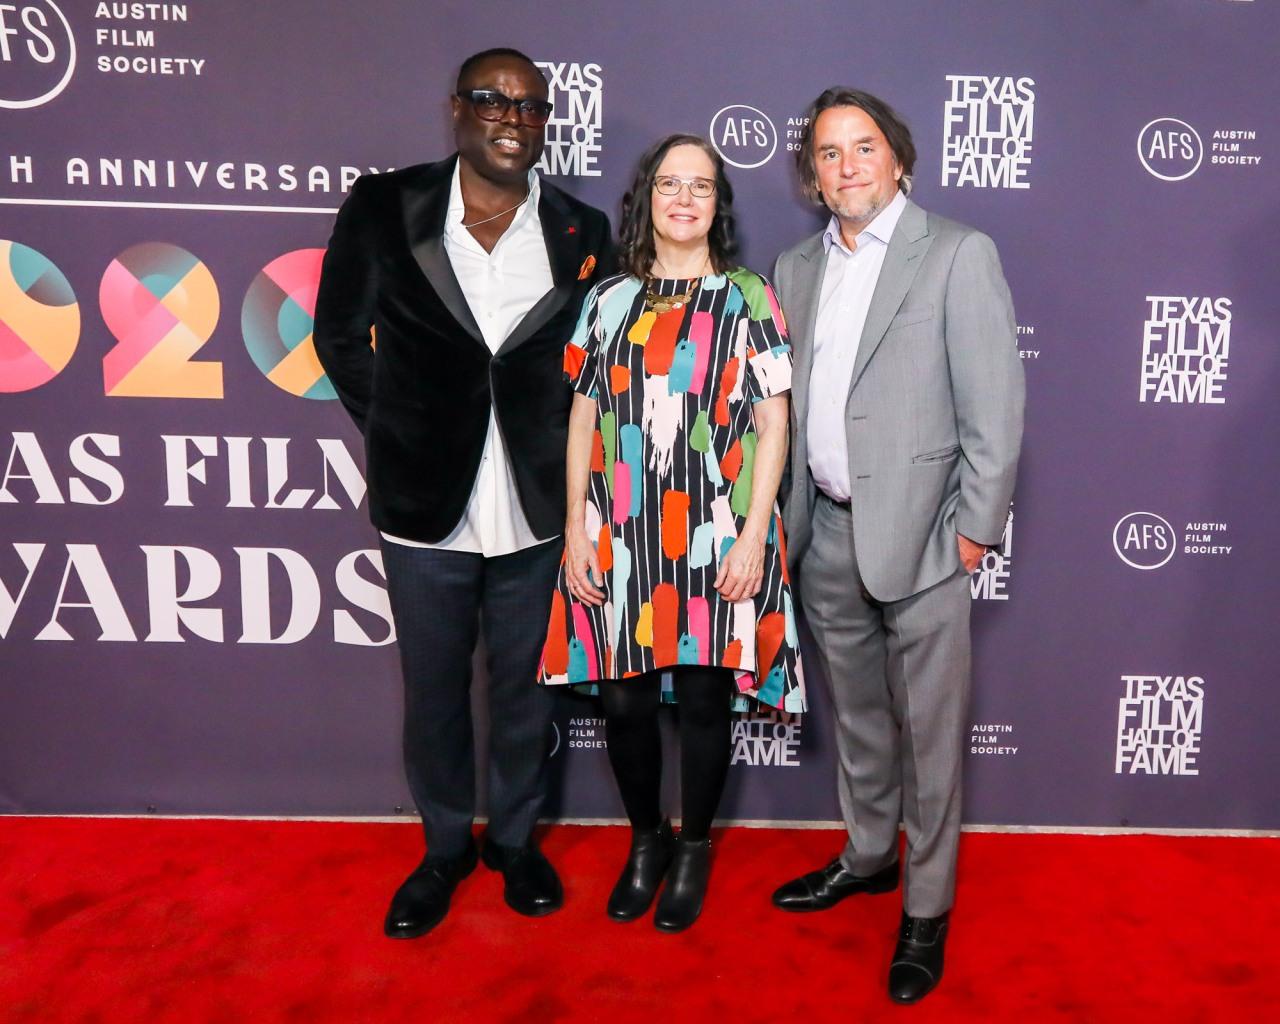 More 20th Anniversary Texas Film AwardsPhotos